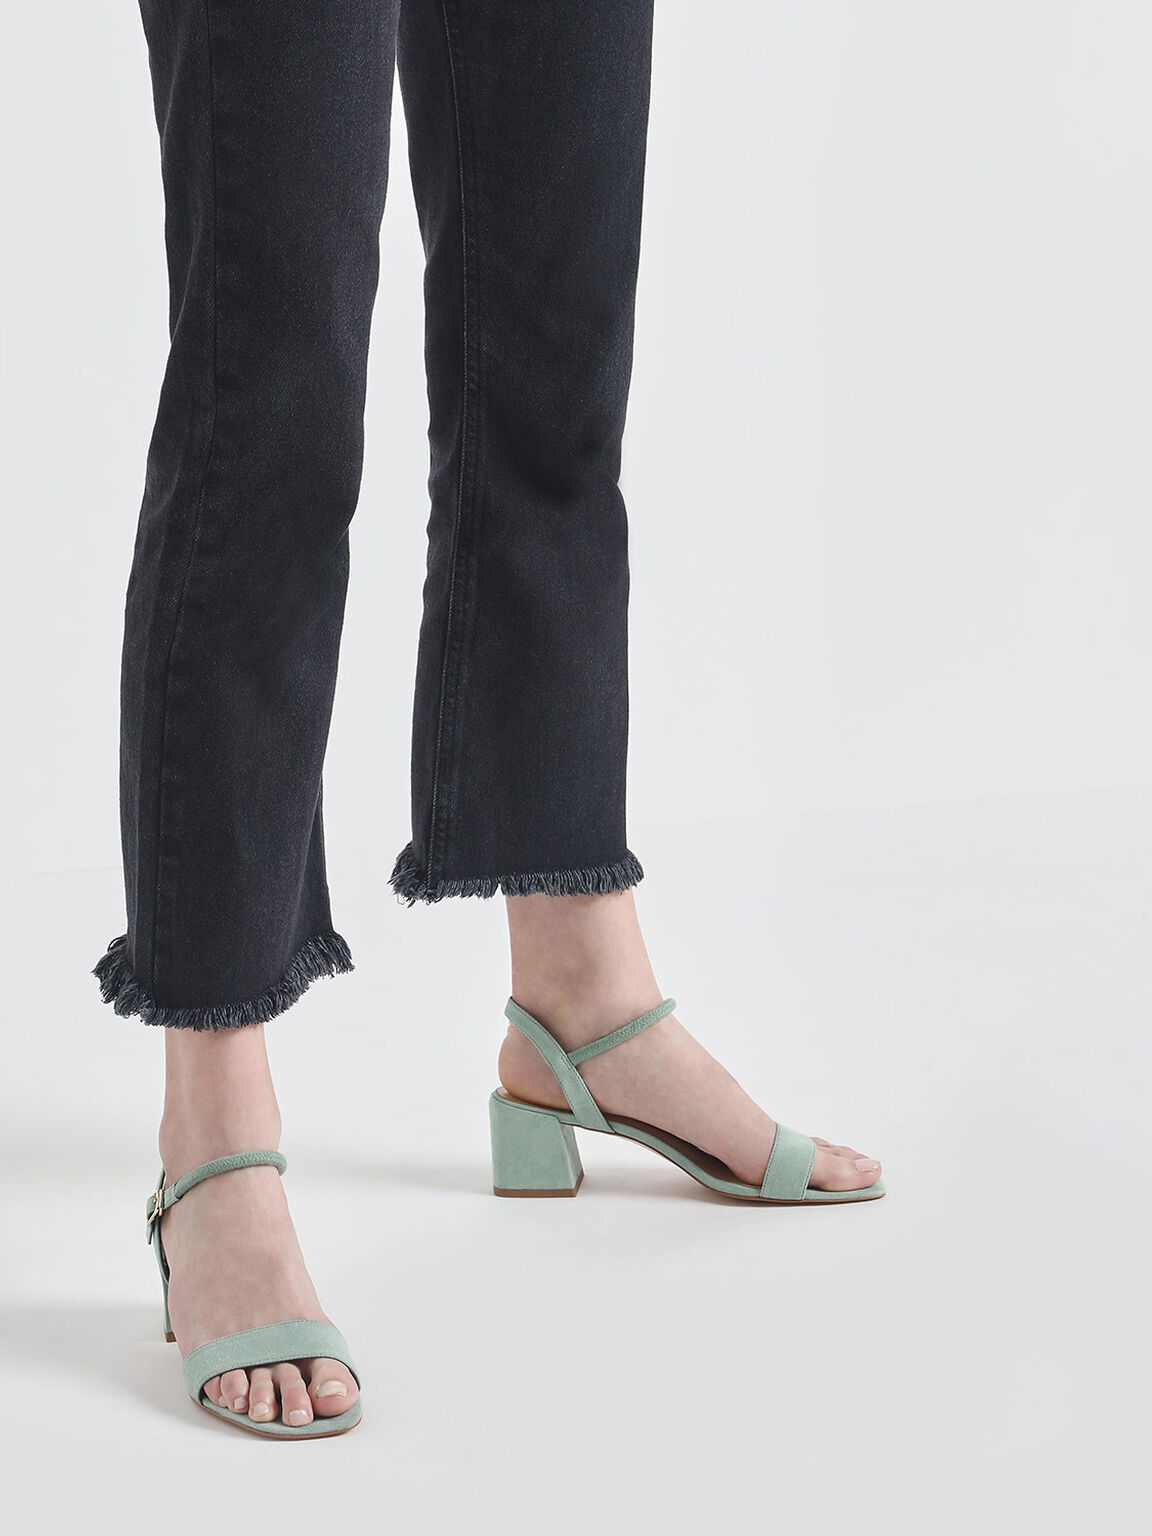 Open Toe Block Heel Sandals, Green, hi-res